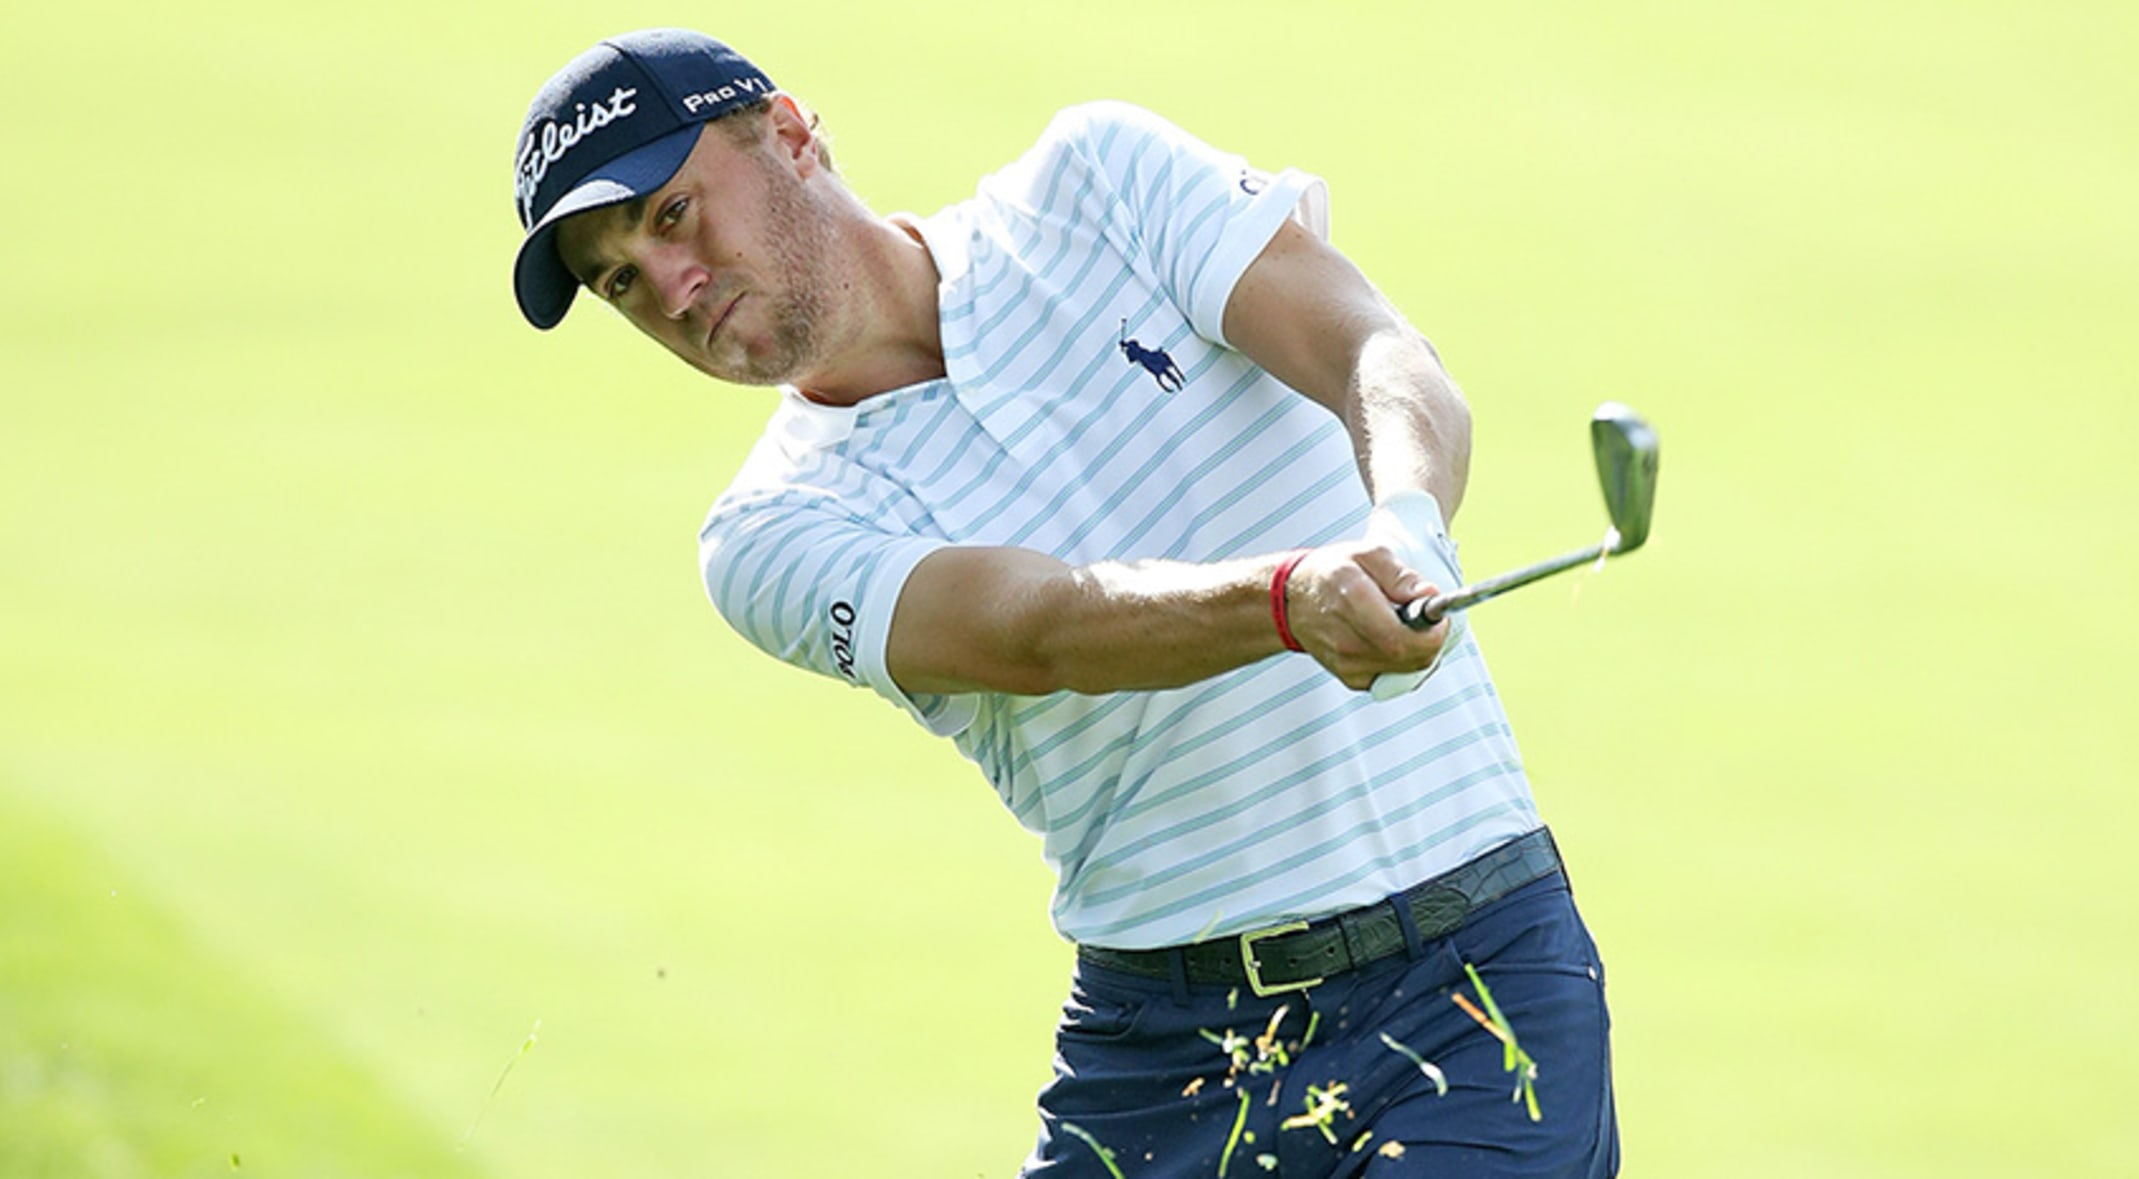 Power Rankings Fantasy Golf Advice For Dell Technologies Championship